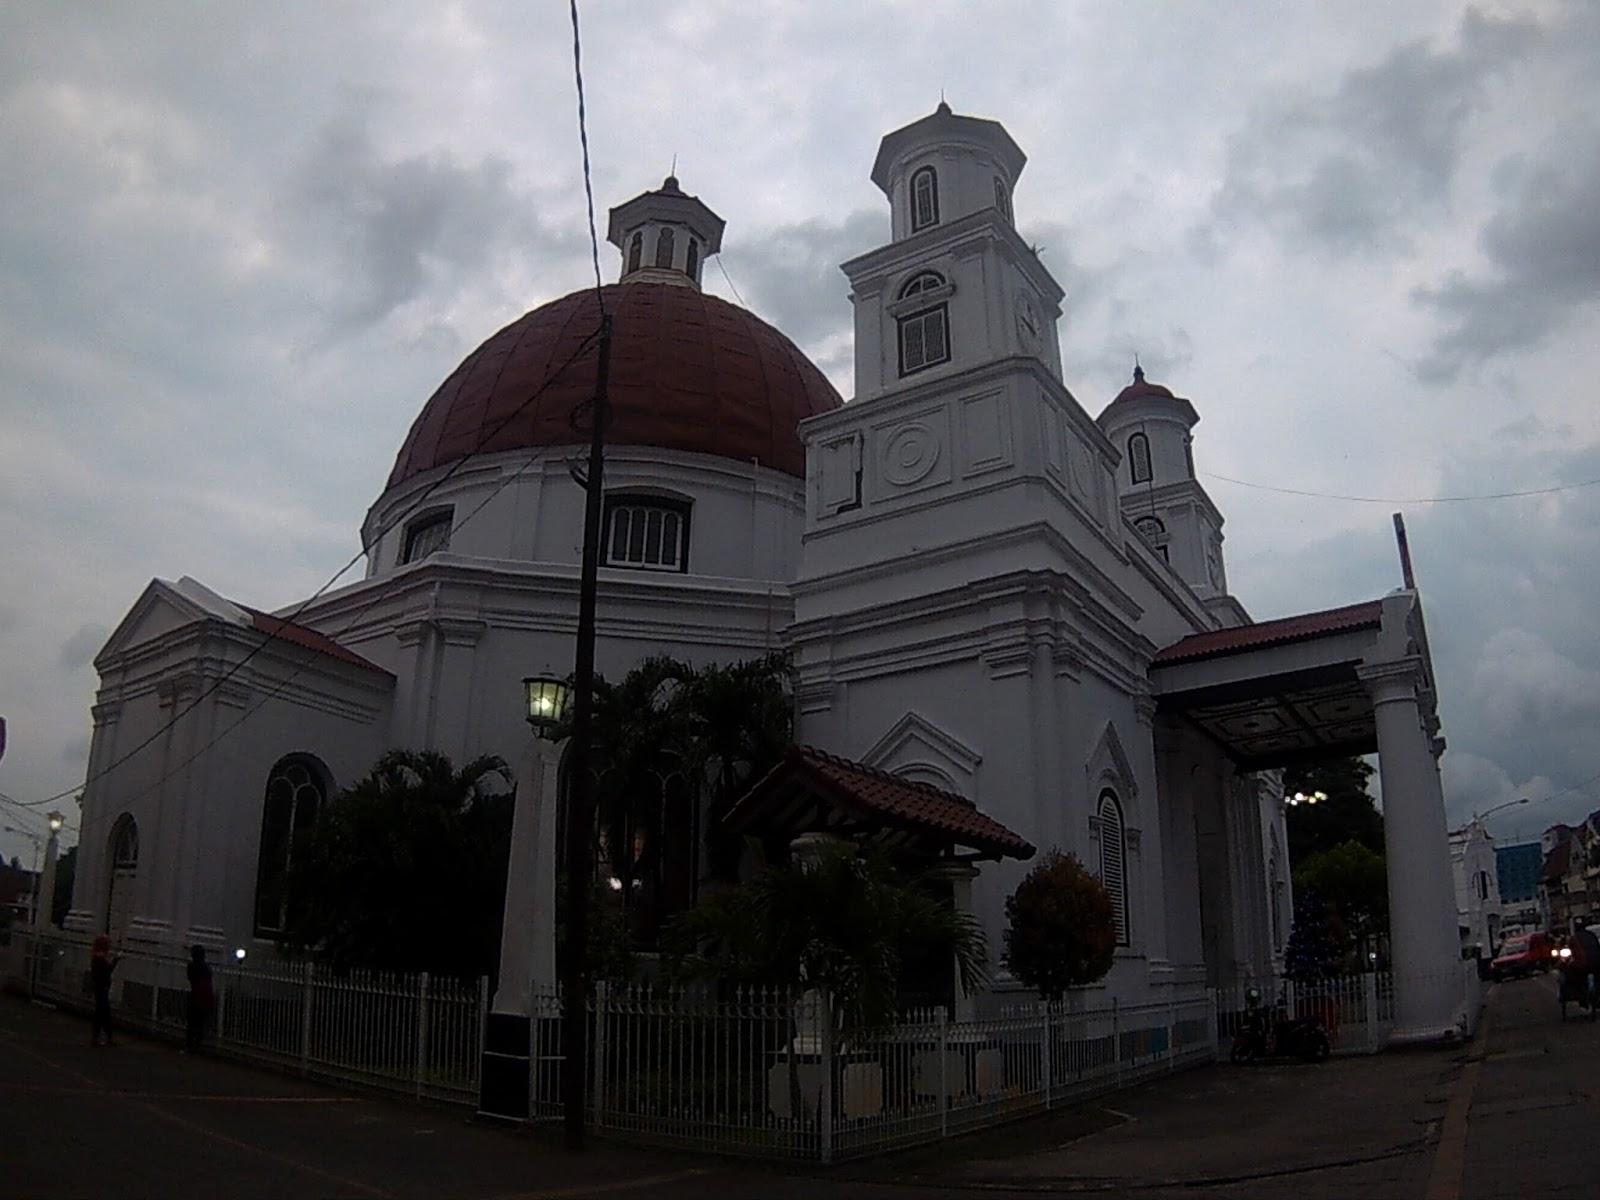 Indriani Blog Explore Kota Semarang Bagian 2 3 Kawasan Menjadi